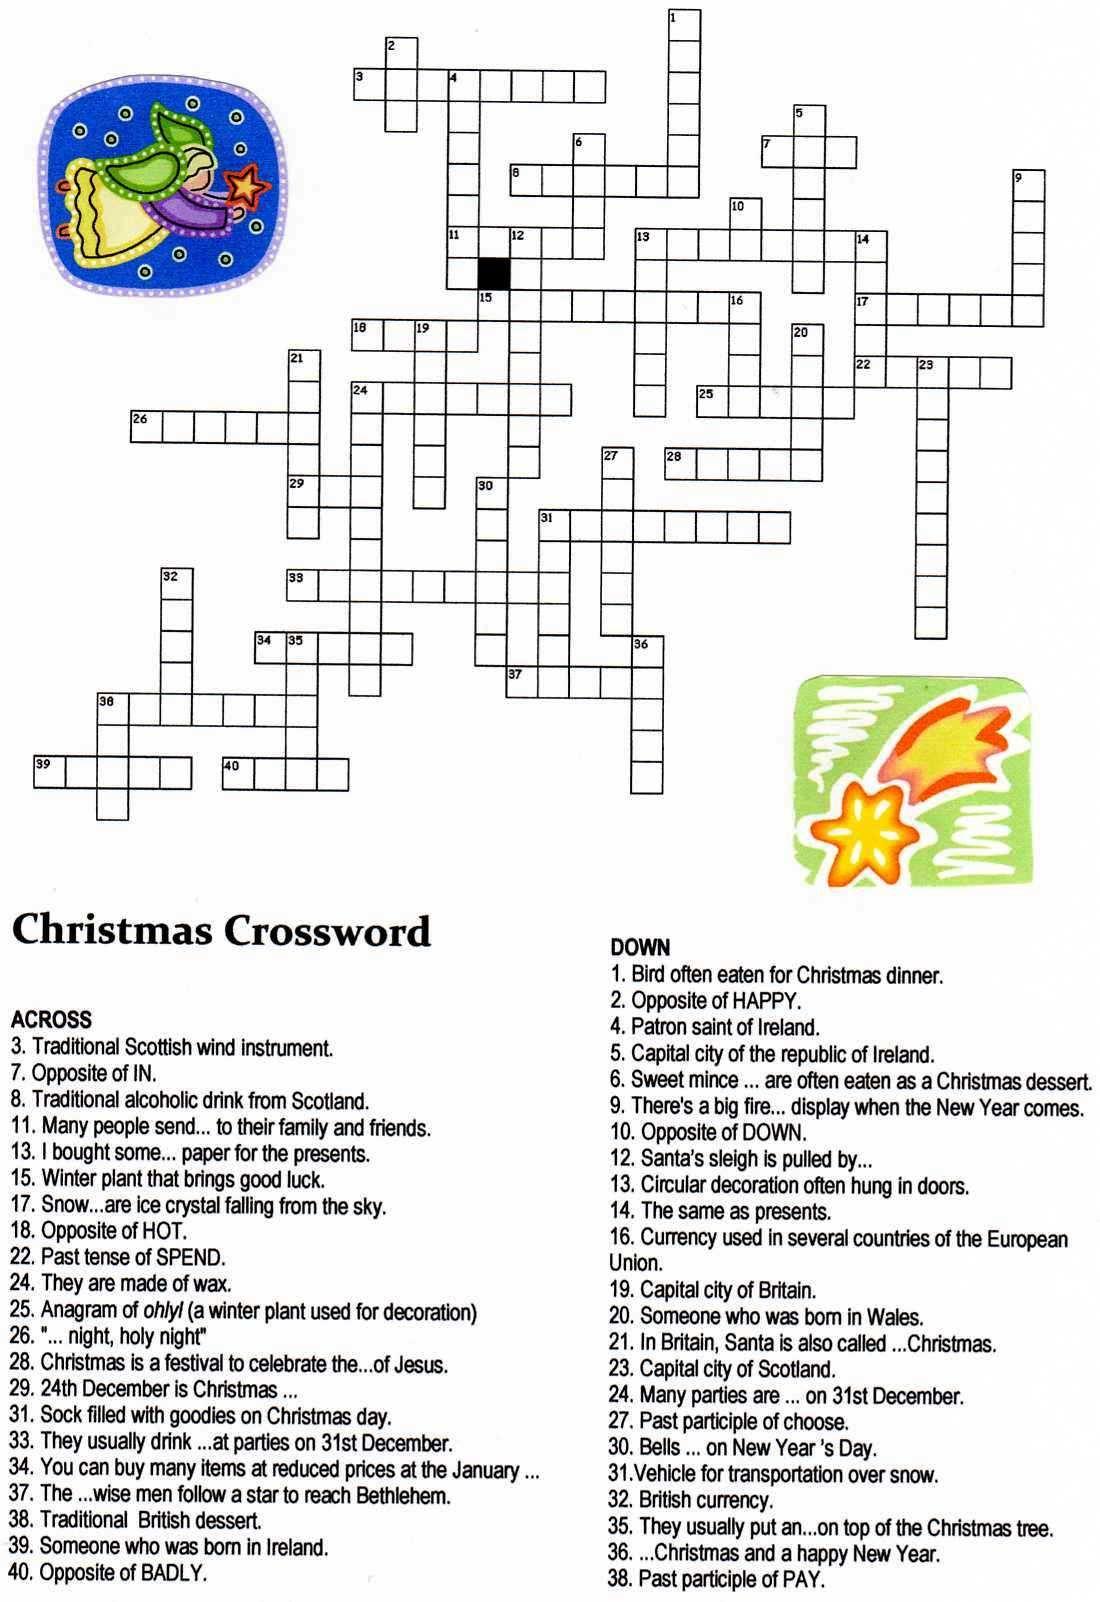 Christmas Angel Crossword Puzzle